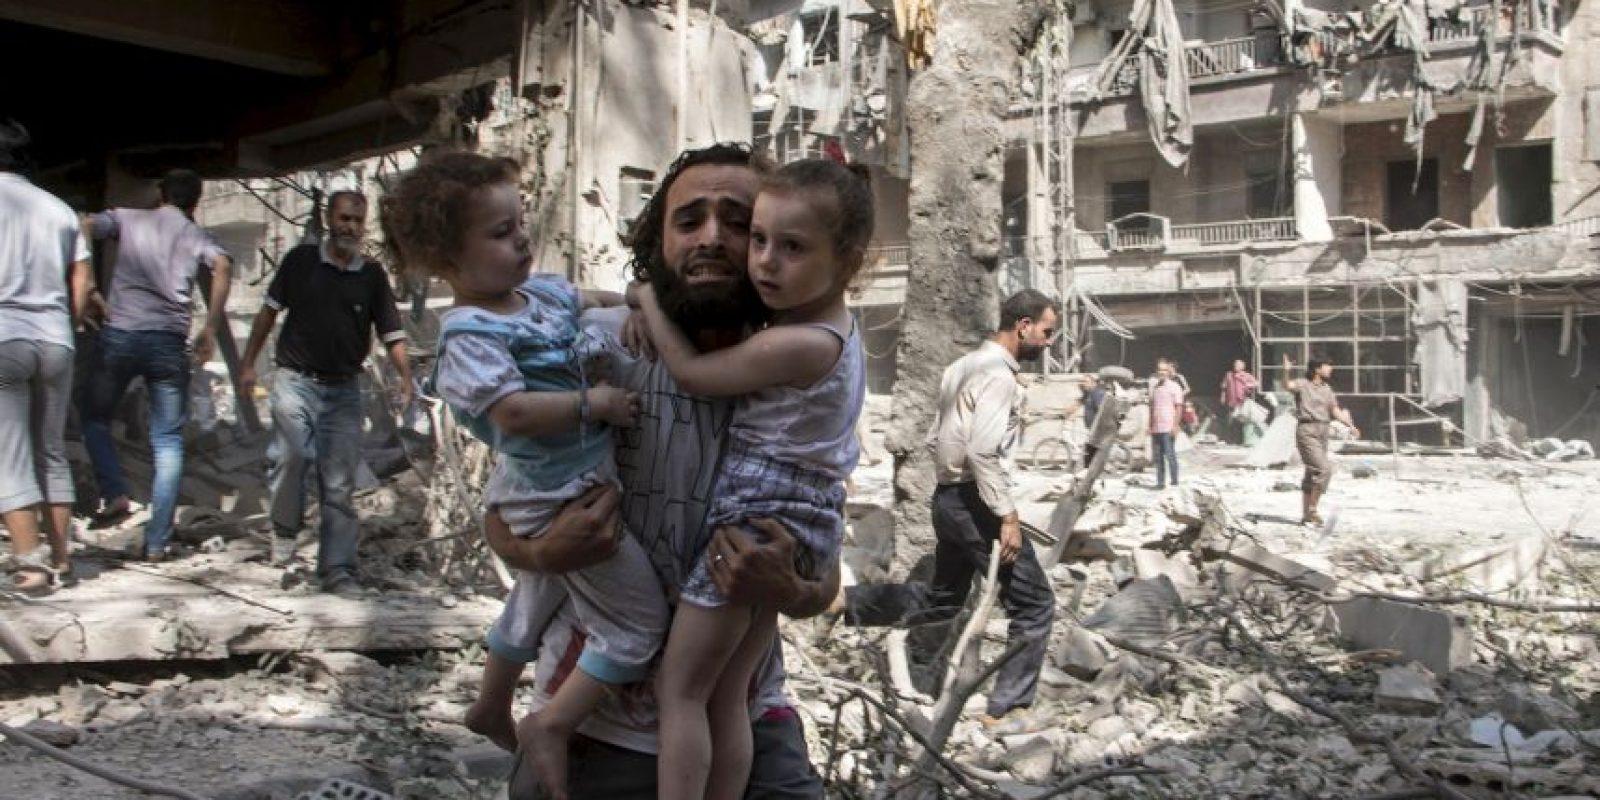 Hombre trata de salvar a dos niñas tras detonaciones de bomba en Siria. Foto:AFP